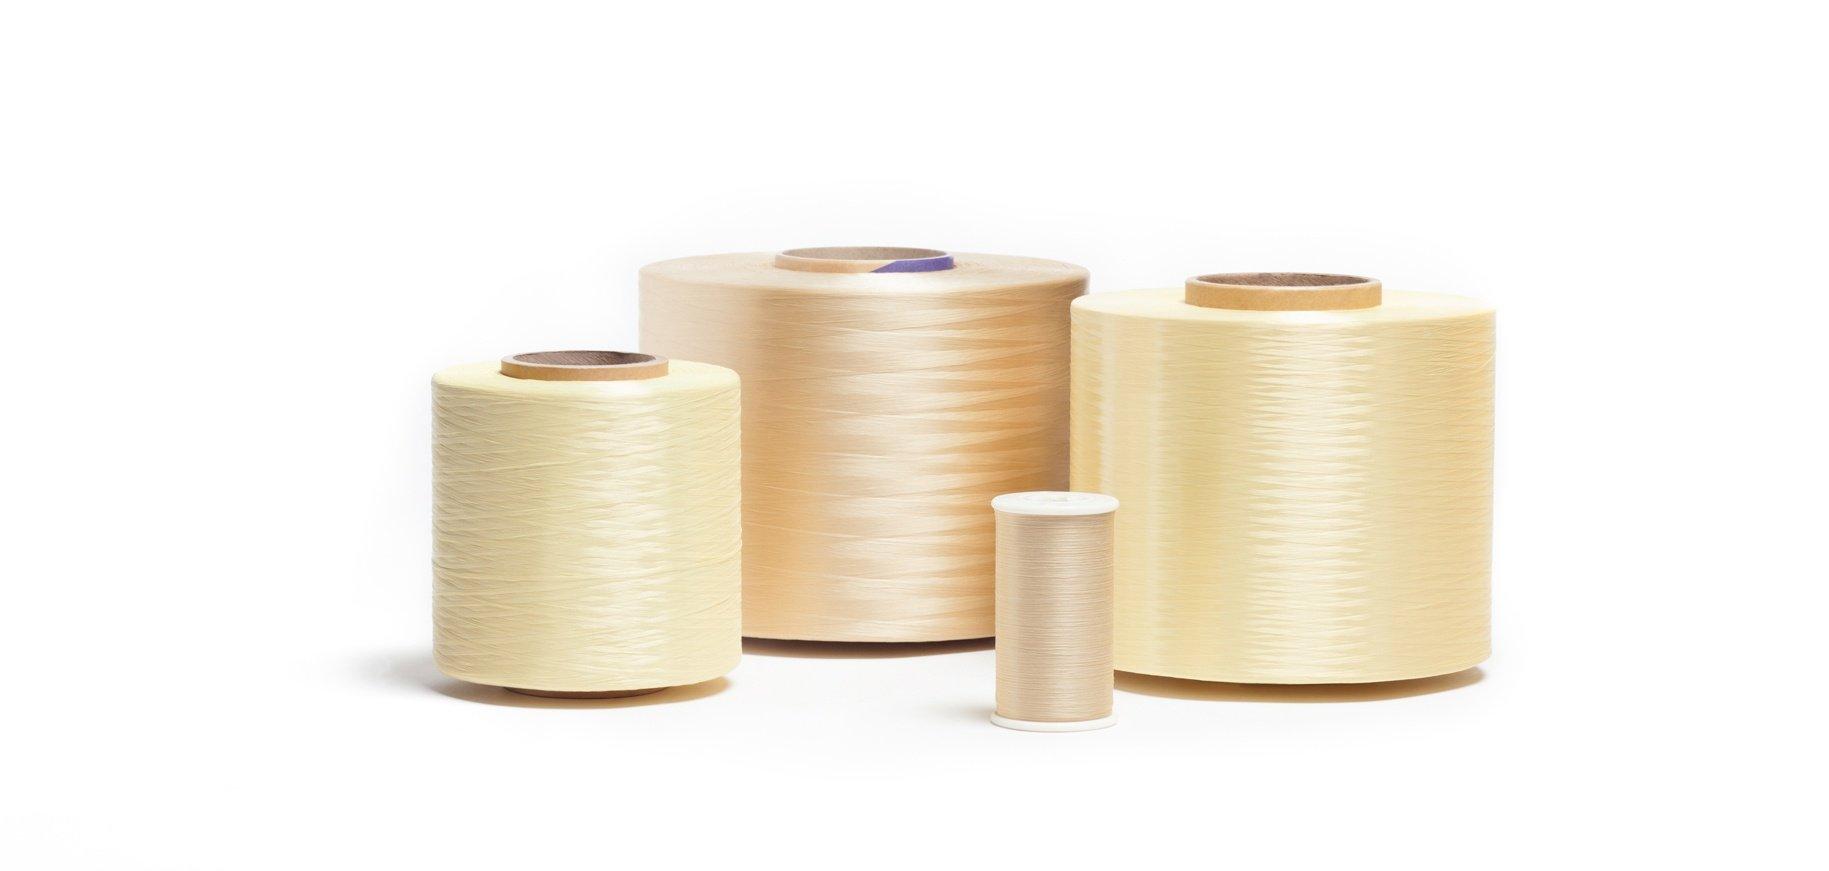 Fire retardant yarn and thread